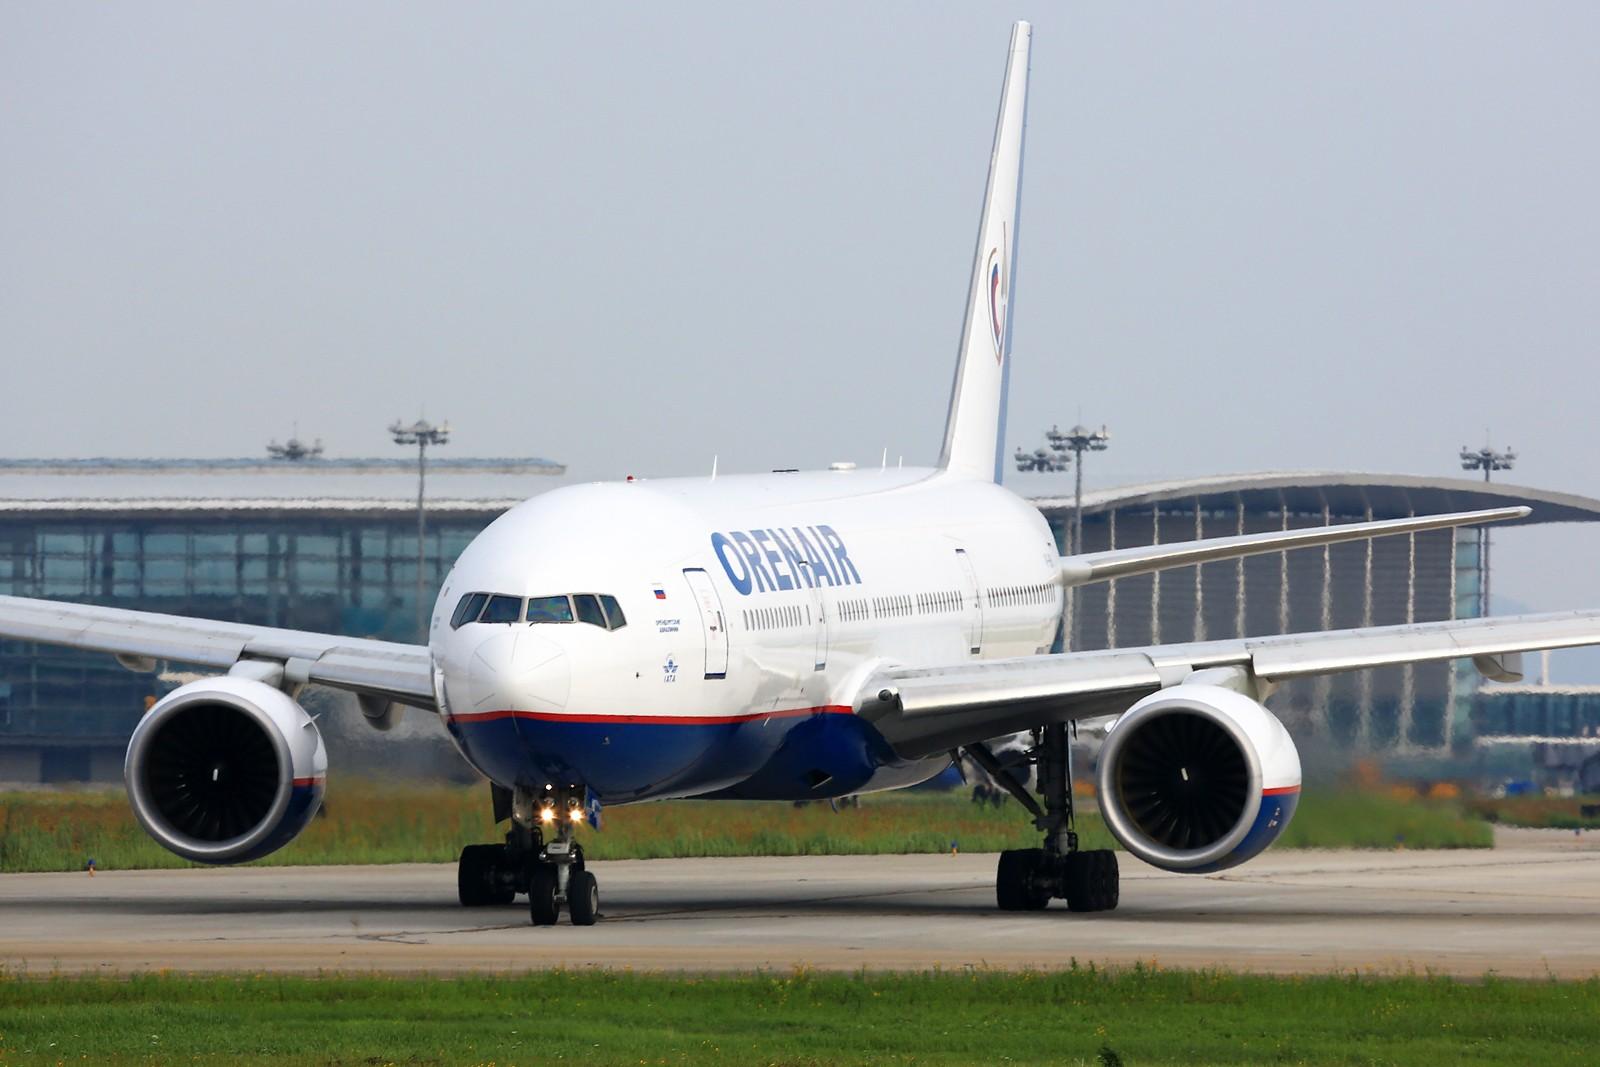 Re:[原创]【NKG】******小公园一天蹲到俩毛子:奥伦堡772+伏尔加第聂伯IL-76TD****** BOEING 777-200ER VP-BHB 中国南京禄口国际机场